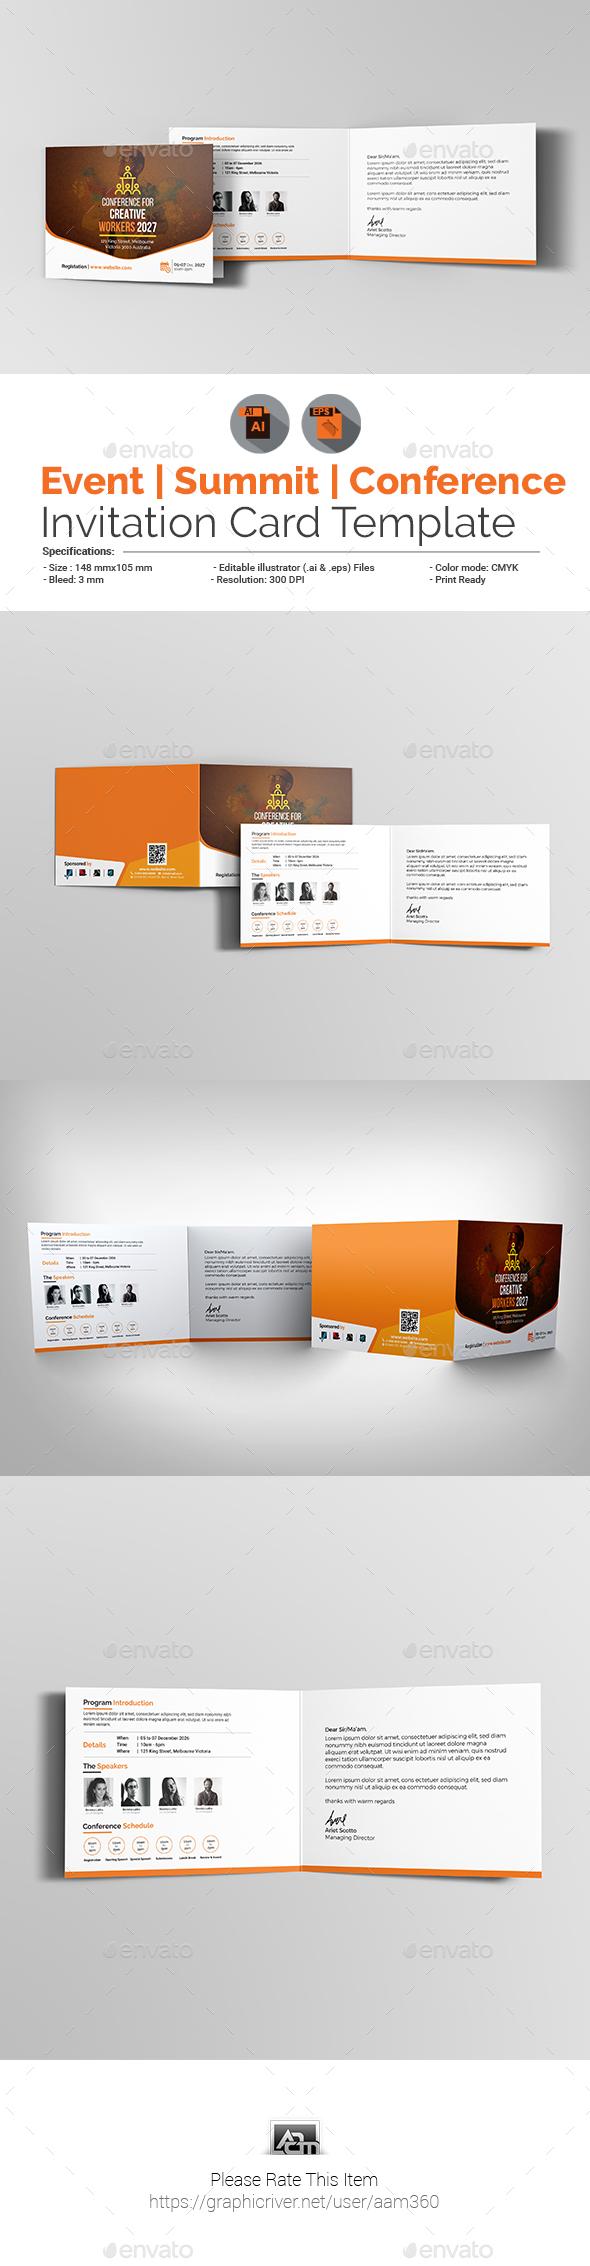 Event Invite Graphics Designs Templates From Graphicriver